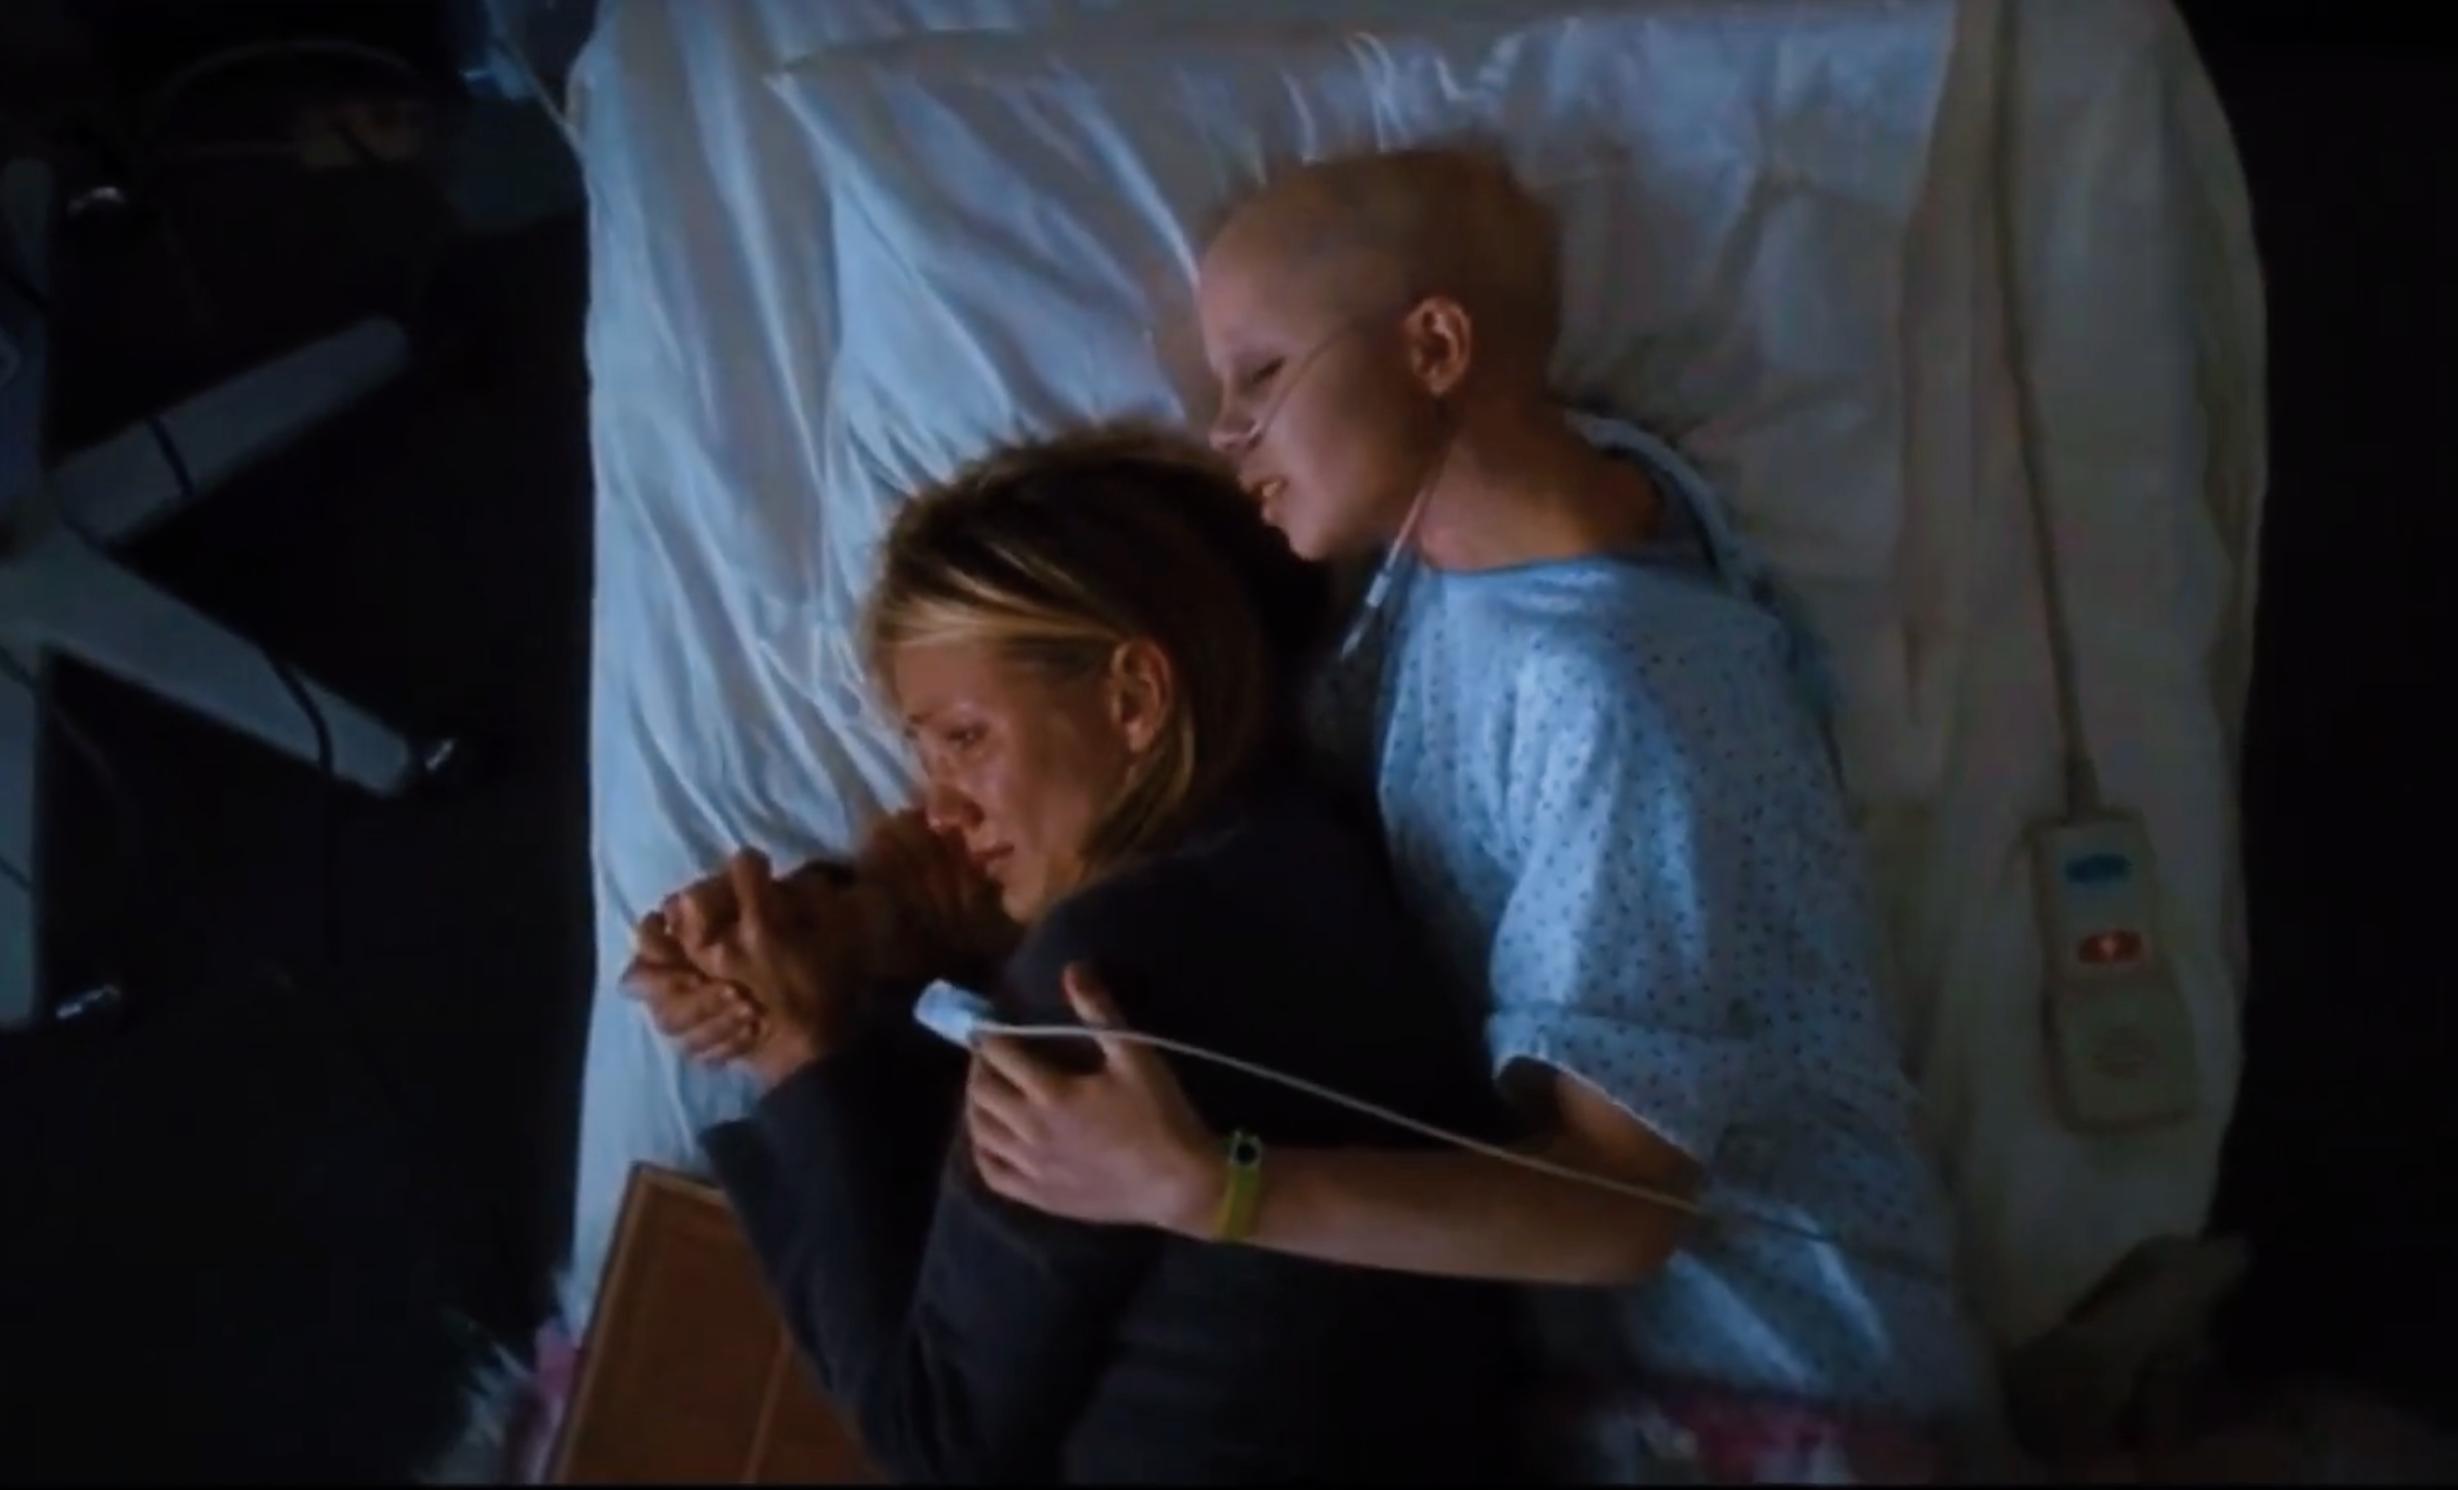 Kate hugging her mom in her hospital bed